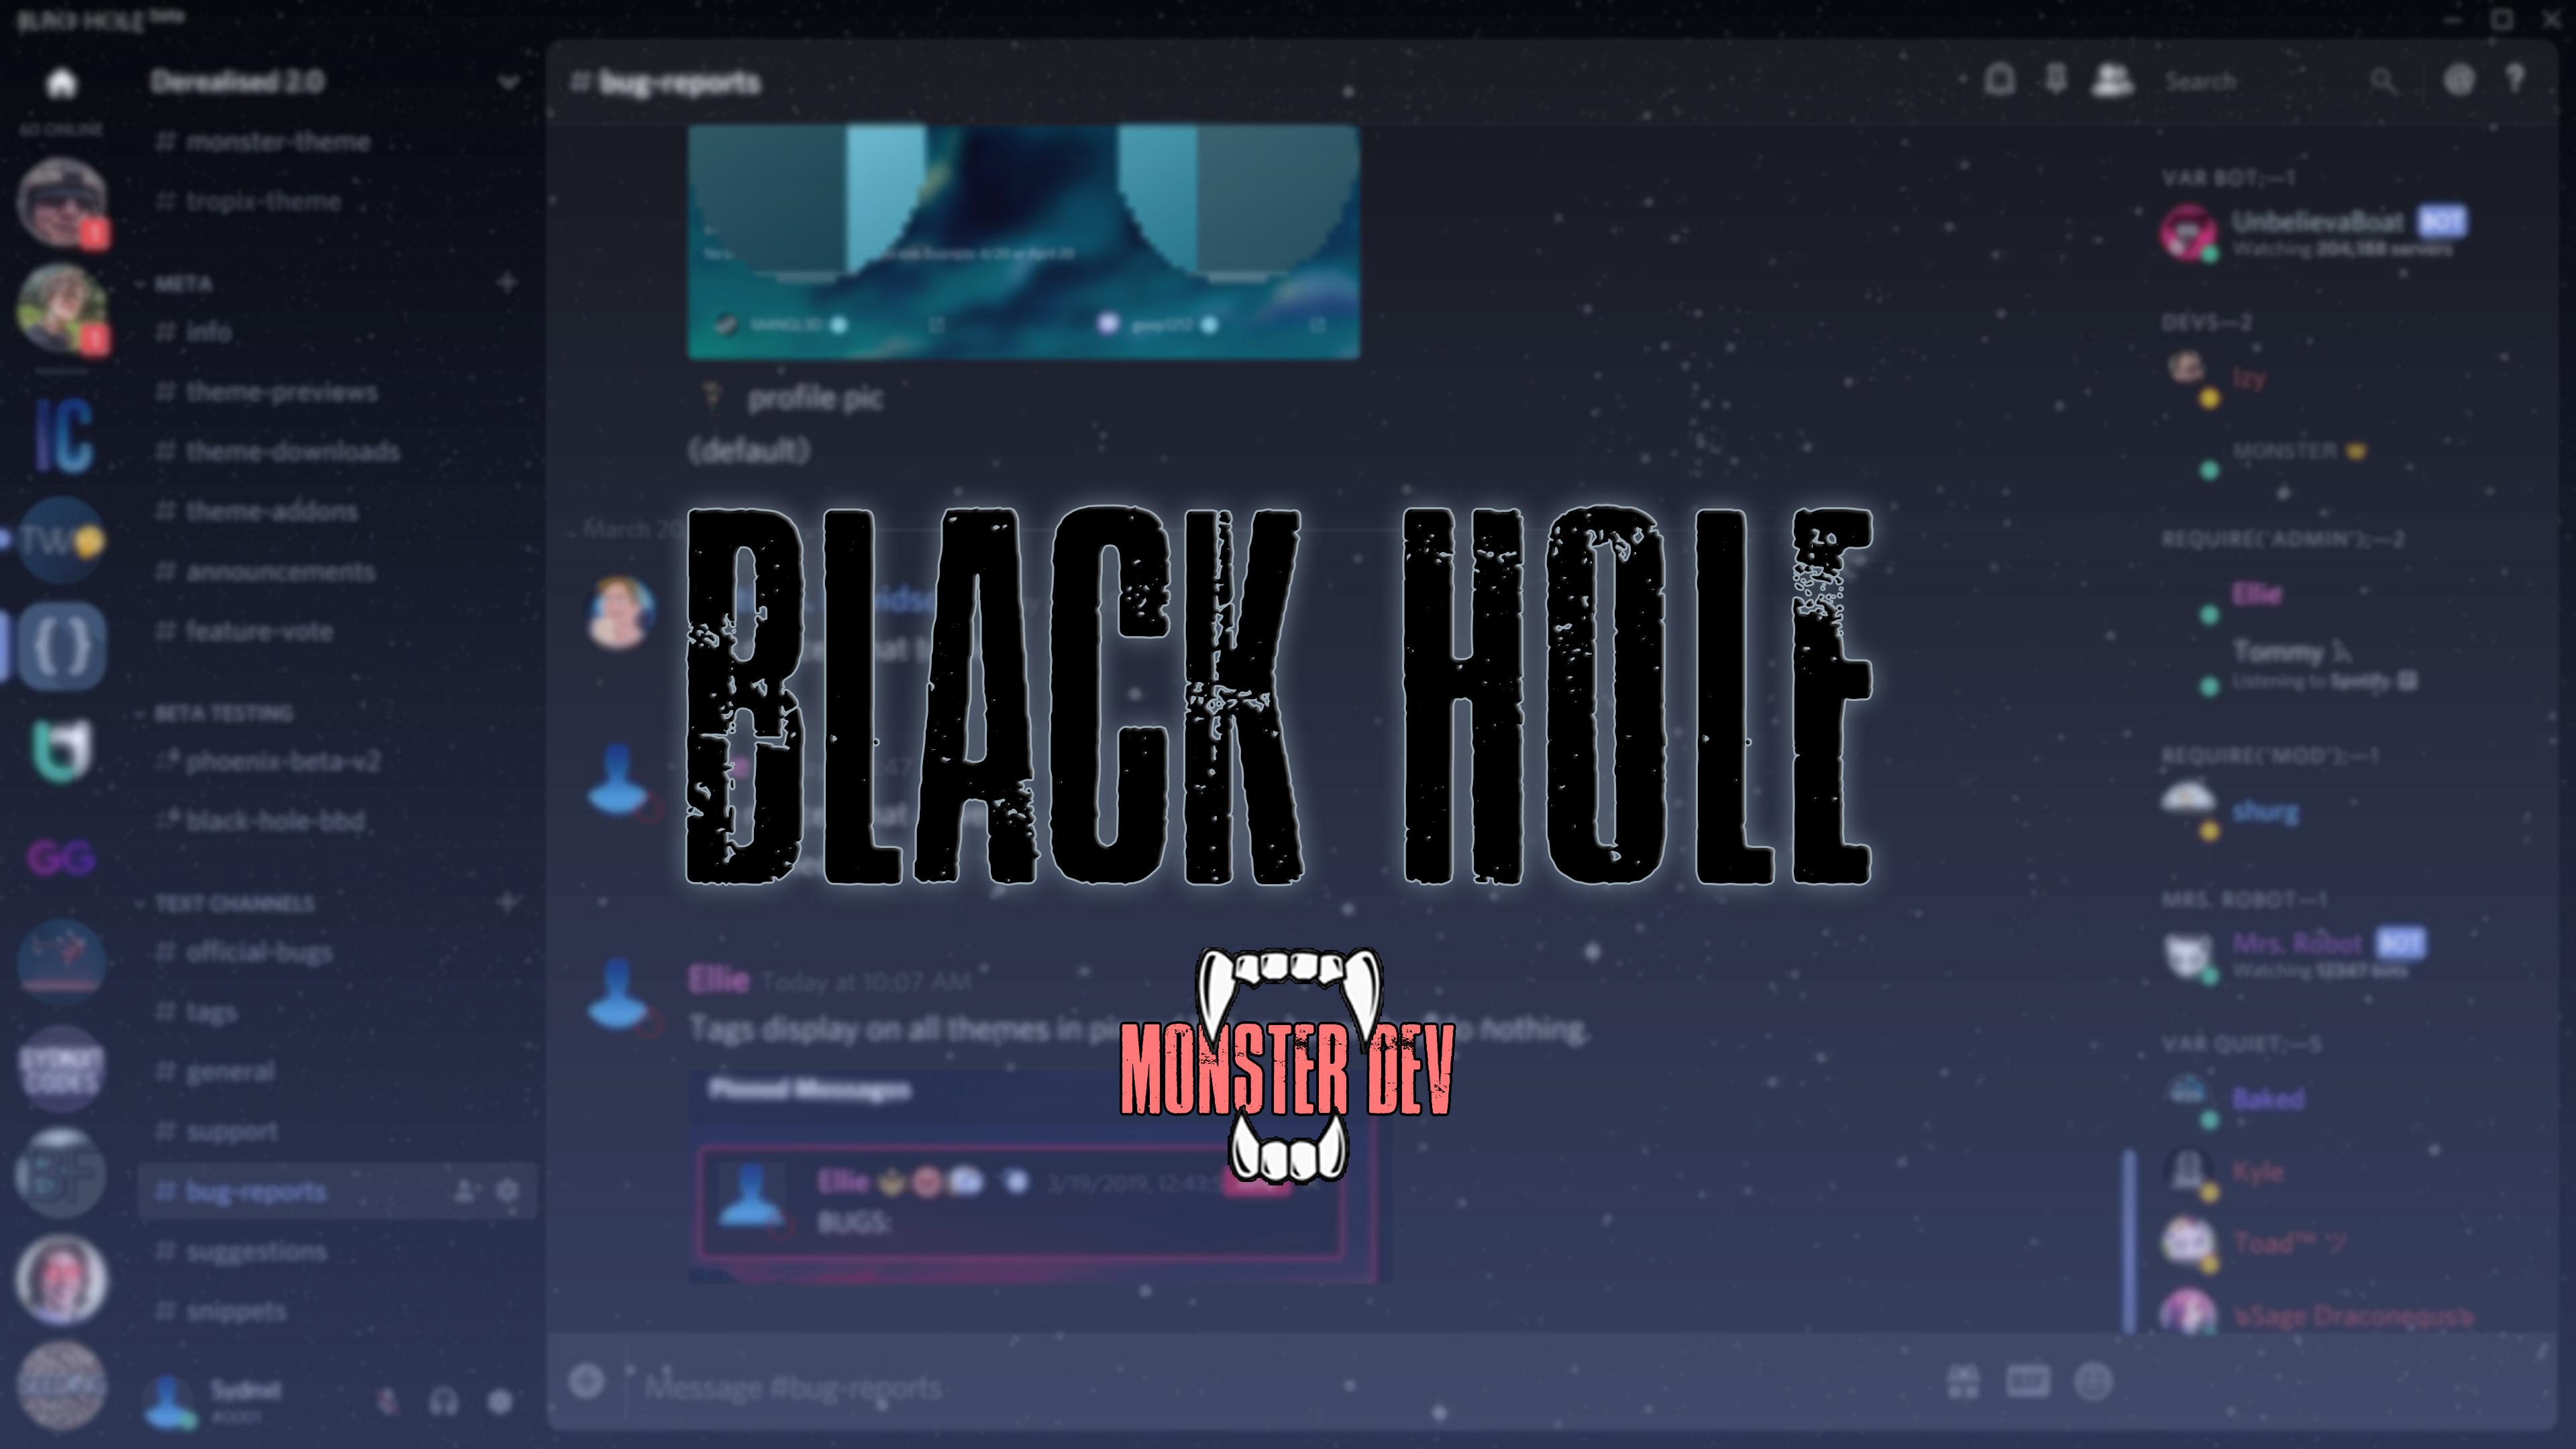 GitHub - monstrousdev/themes: Discord themes